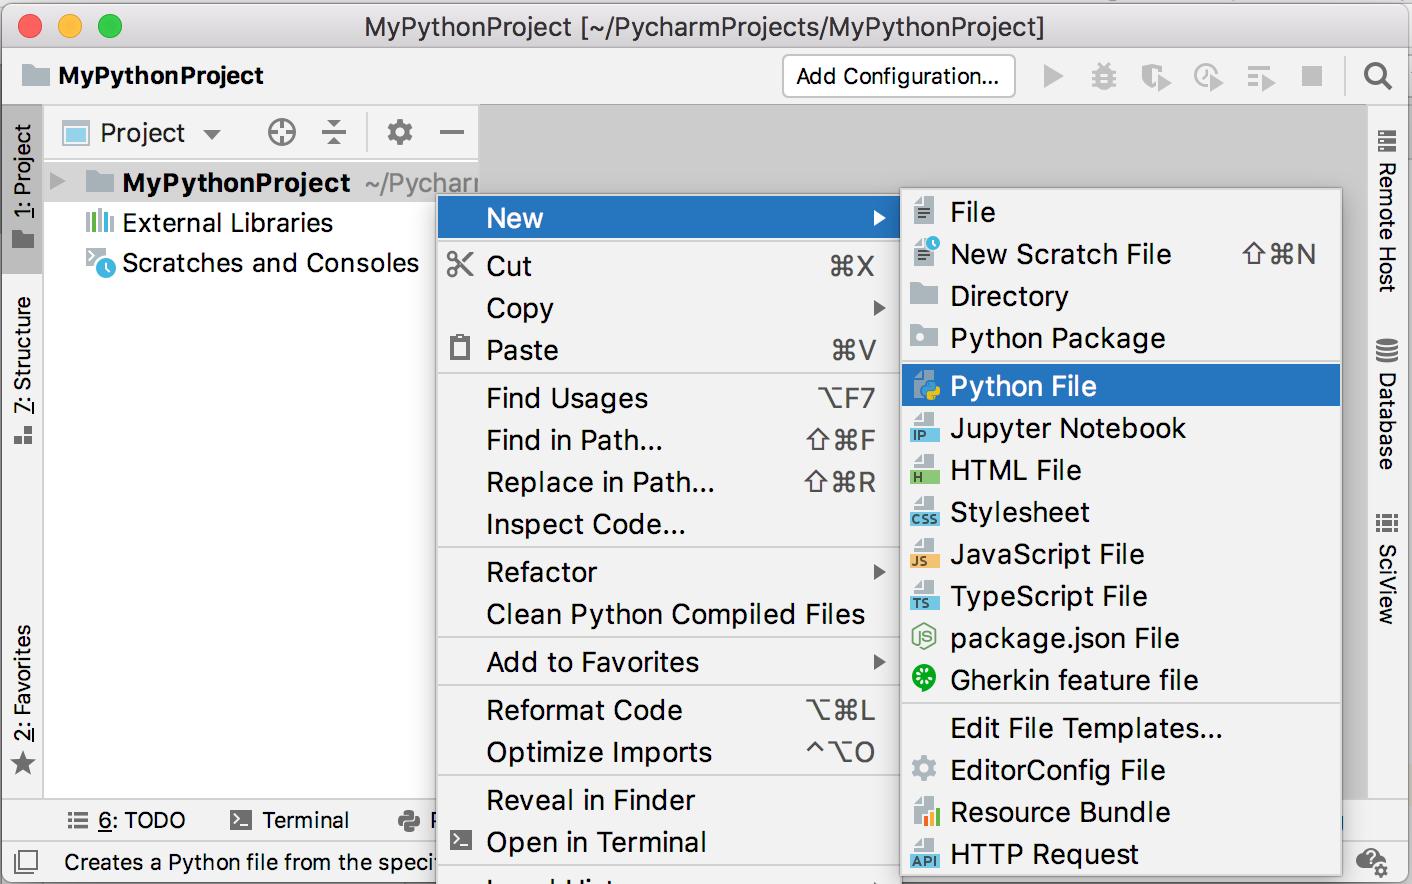 Create a Python file